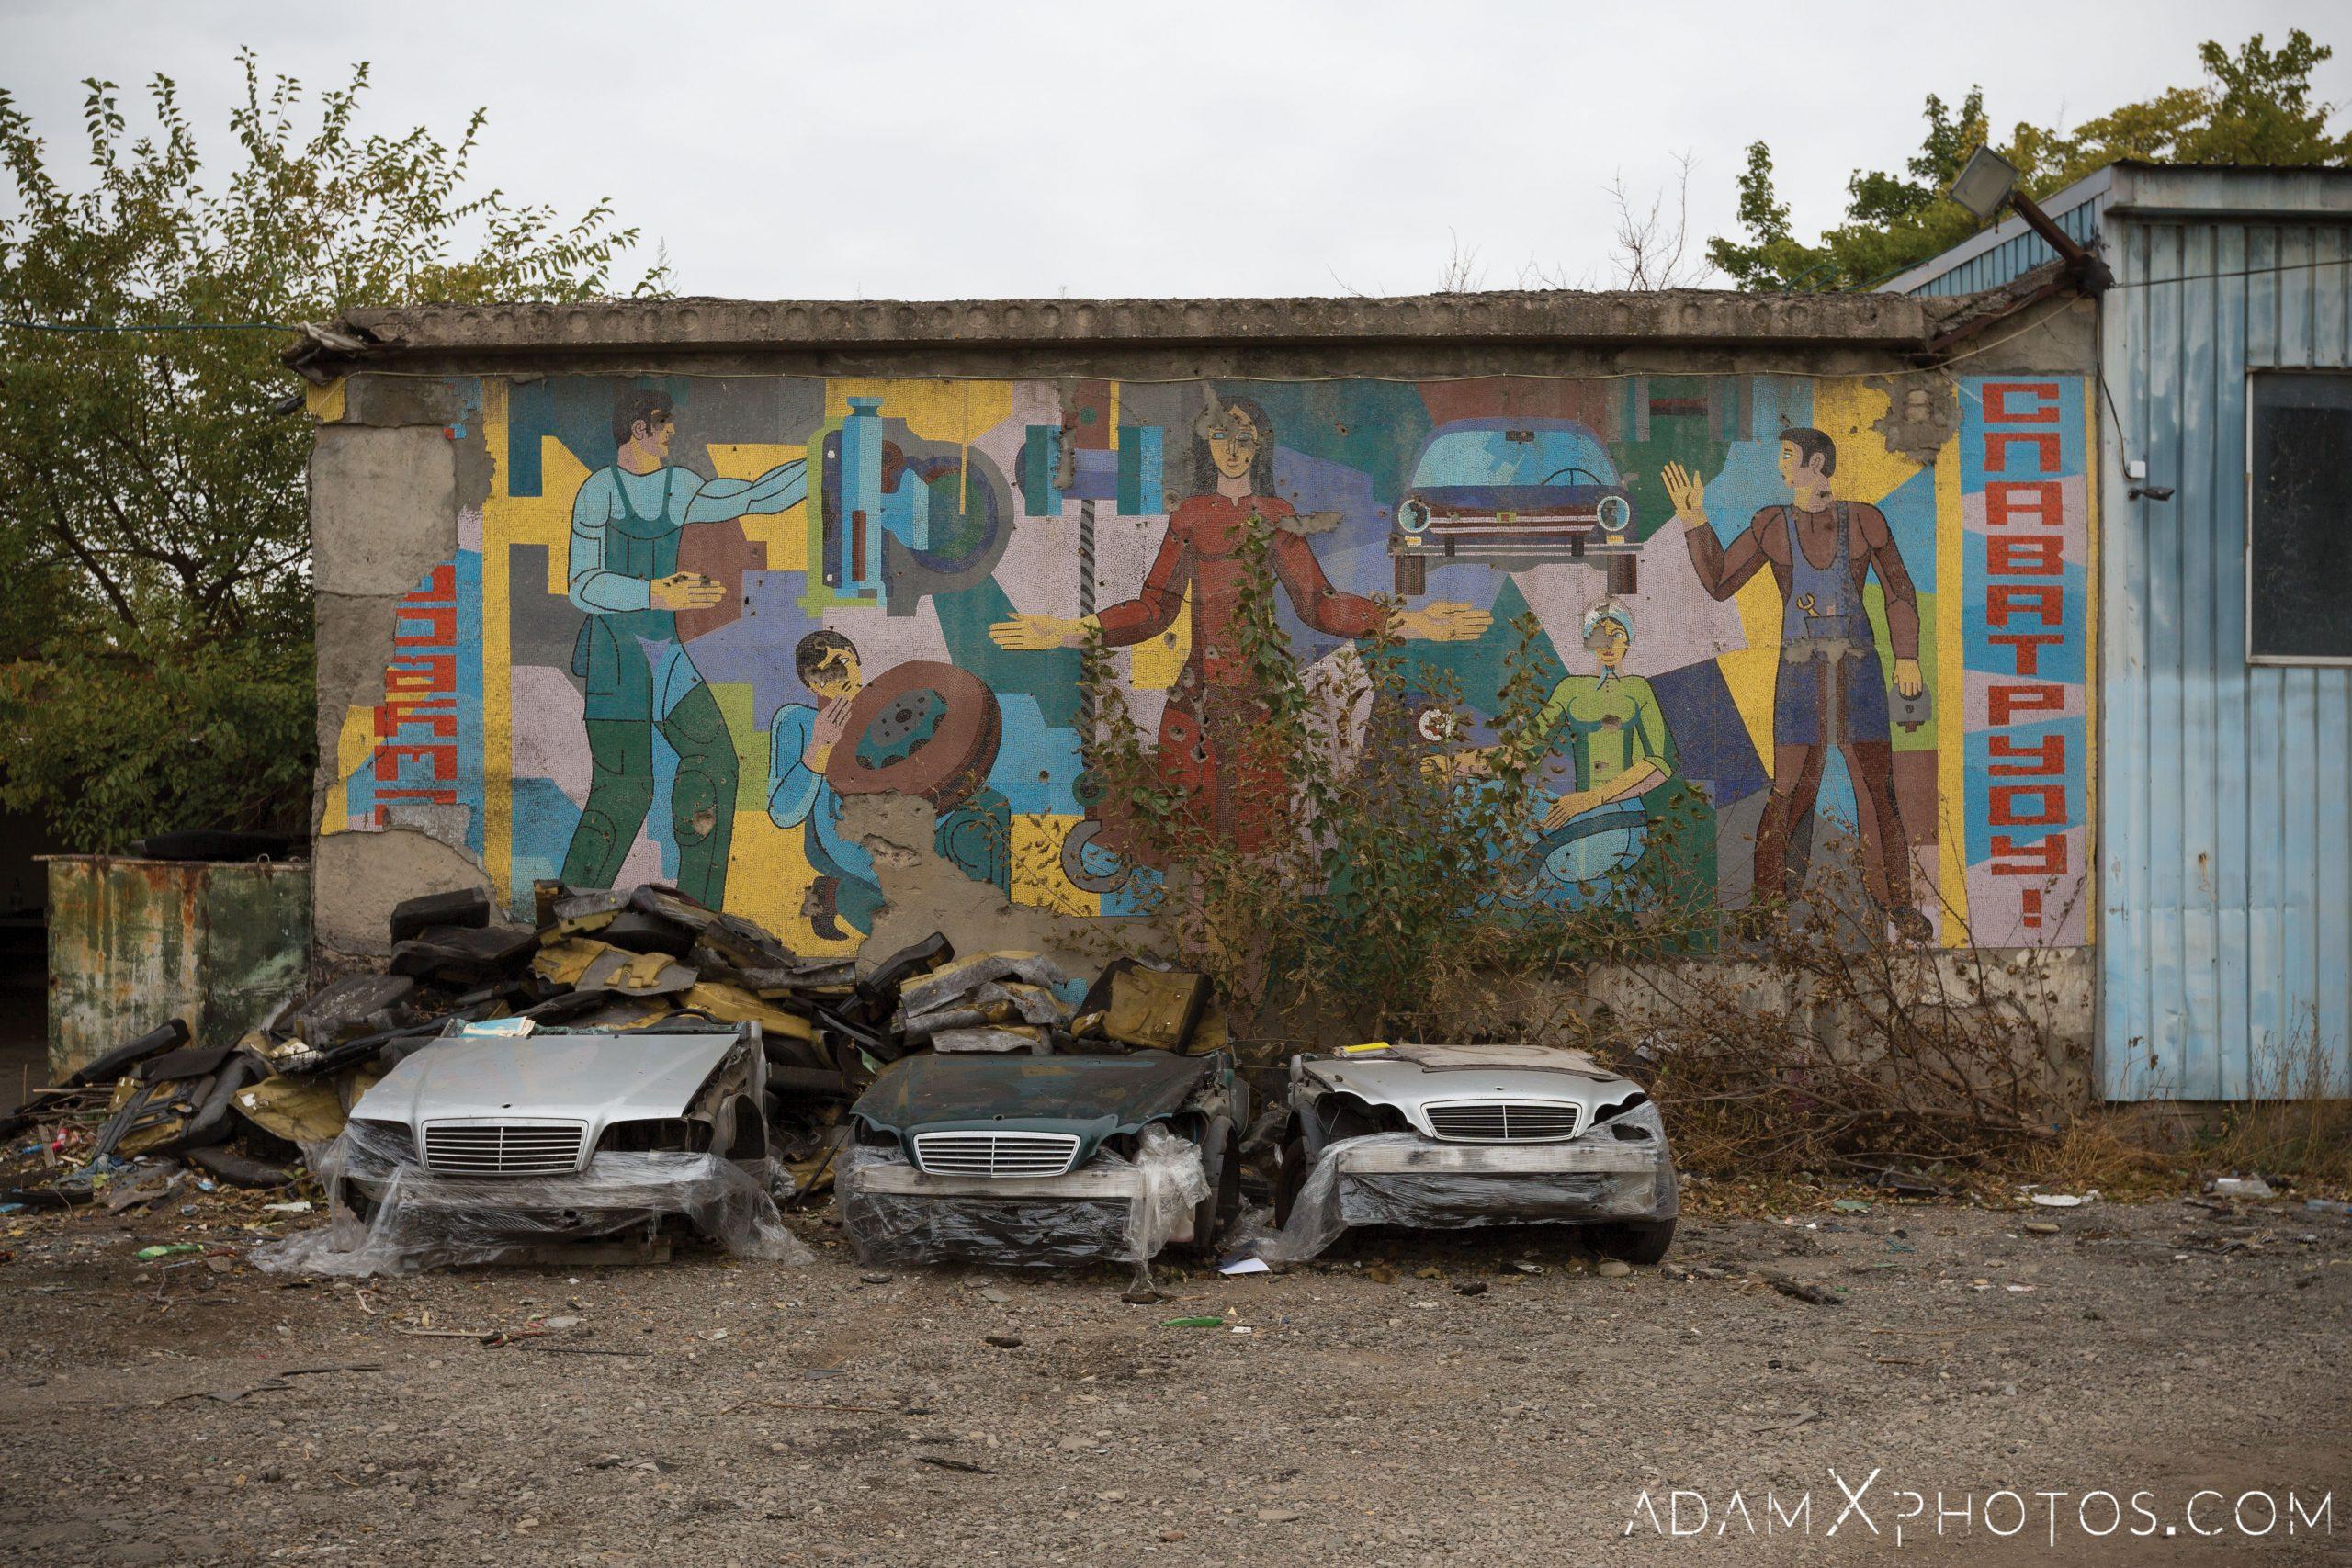 Soviet mural car cars mechanics garage workshop retro cool architecture Tbilisi Georgia Adam X AdamXPhotos Urbex Urban Exploration 2018 2019 Abandoned Access History decay ruins lost forgotten derelict location creepy haunting eerie security